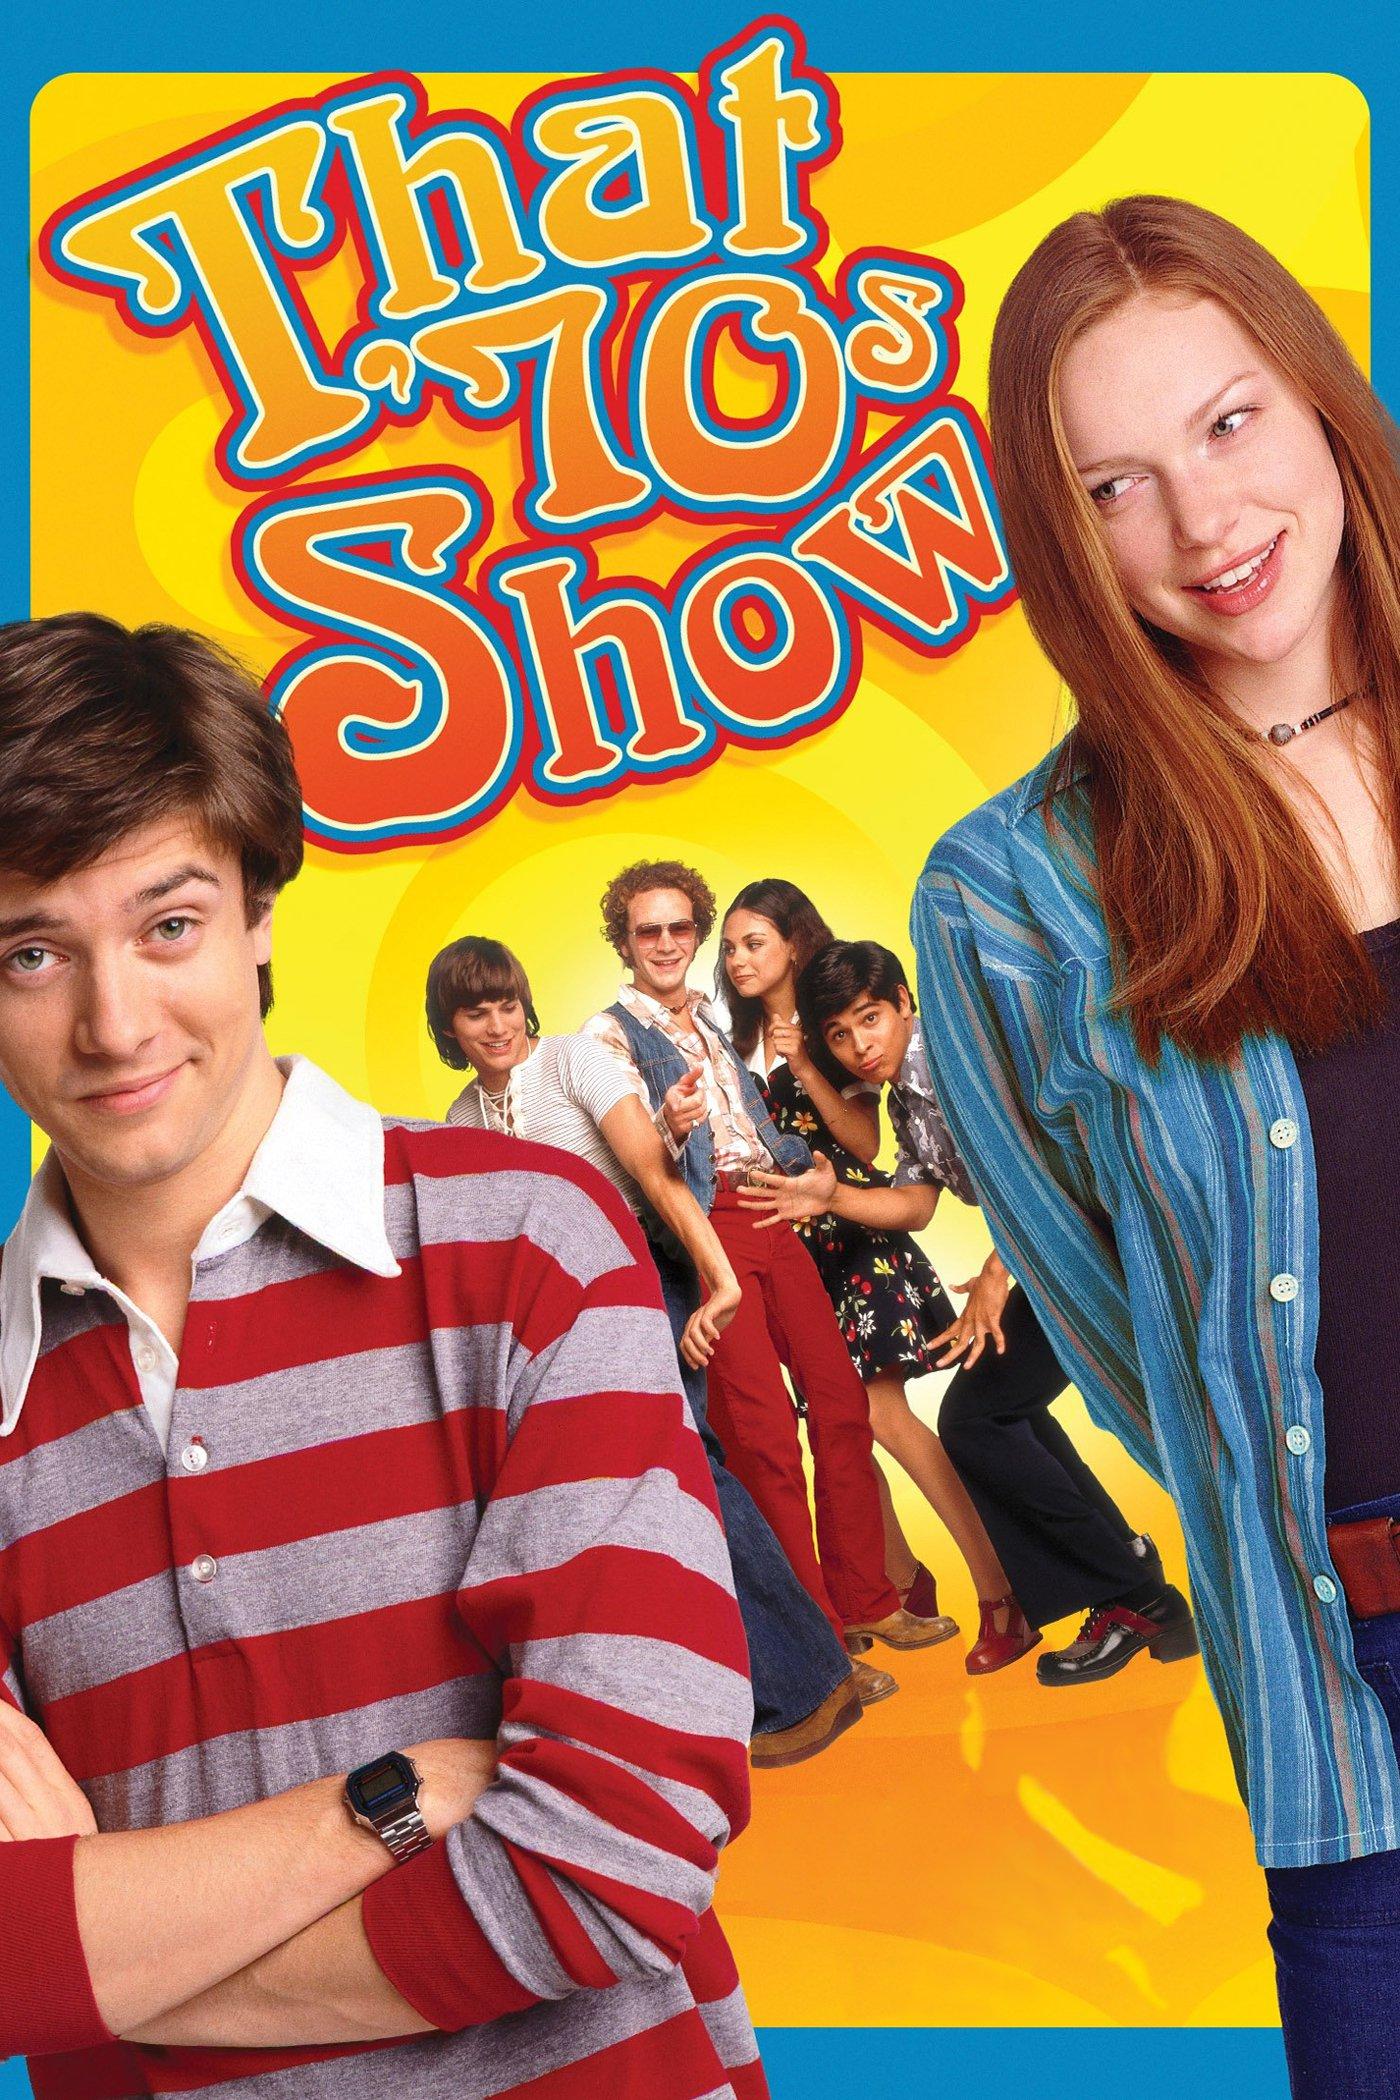 http://exposedsub.ir/دانلود-زیرنویس-فارسی-سریال-That-'70s-Show-.html